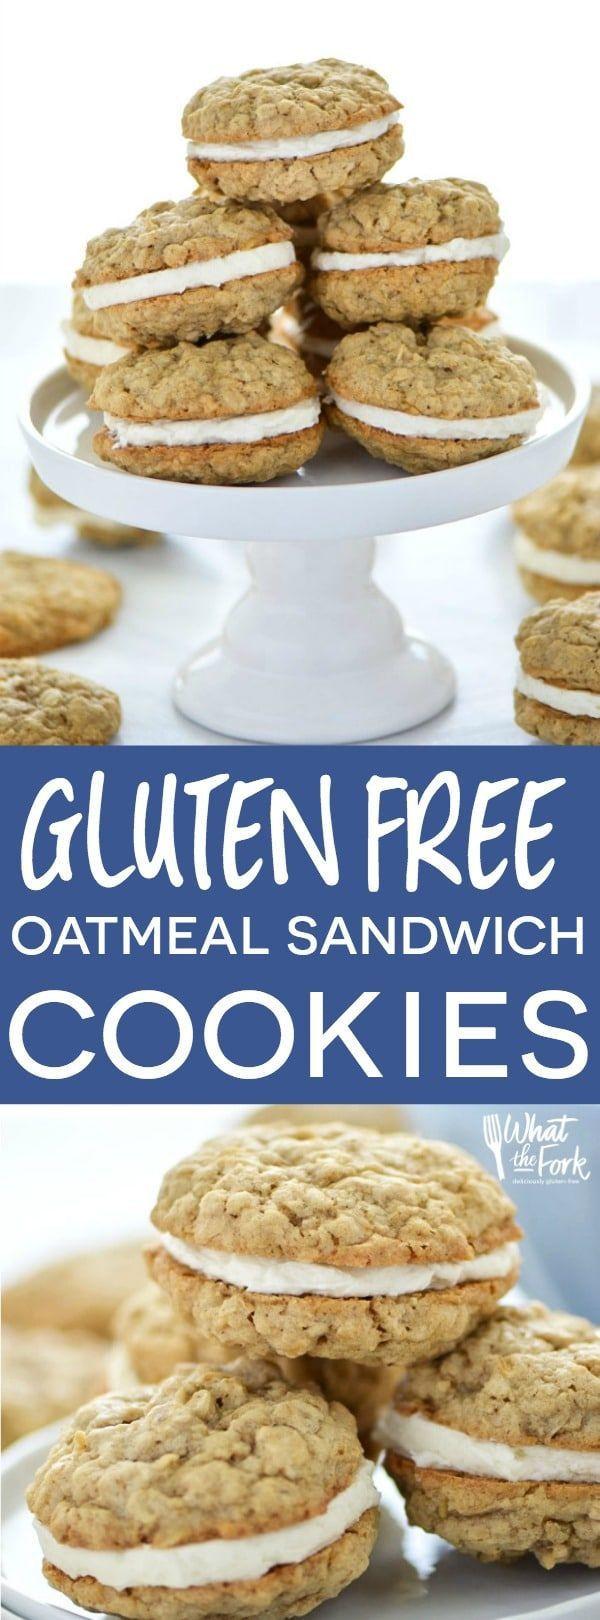 Gluten Free Recipes Dessert  Gluten Free Oatmeal Cream Pies Recipe